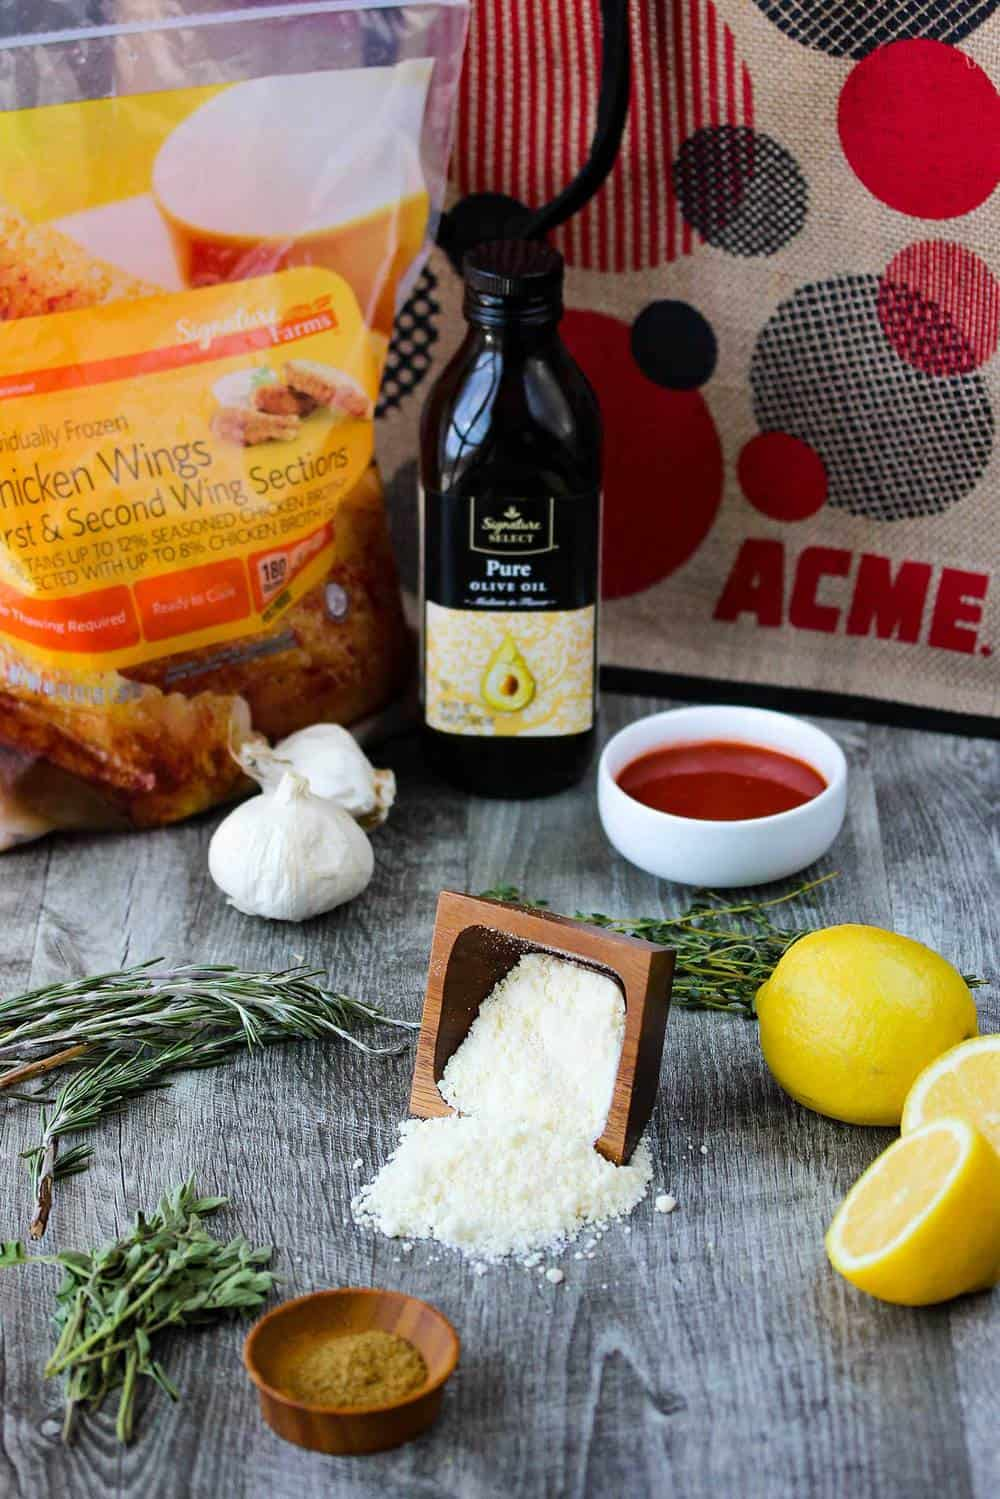 Parmesan and Garlic Chicken Wings recipe